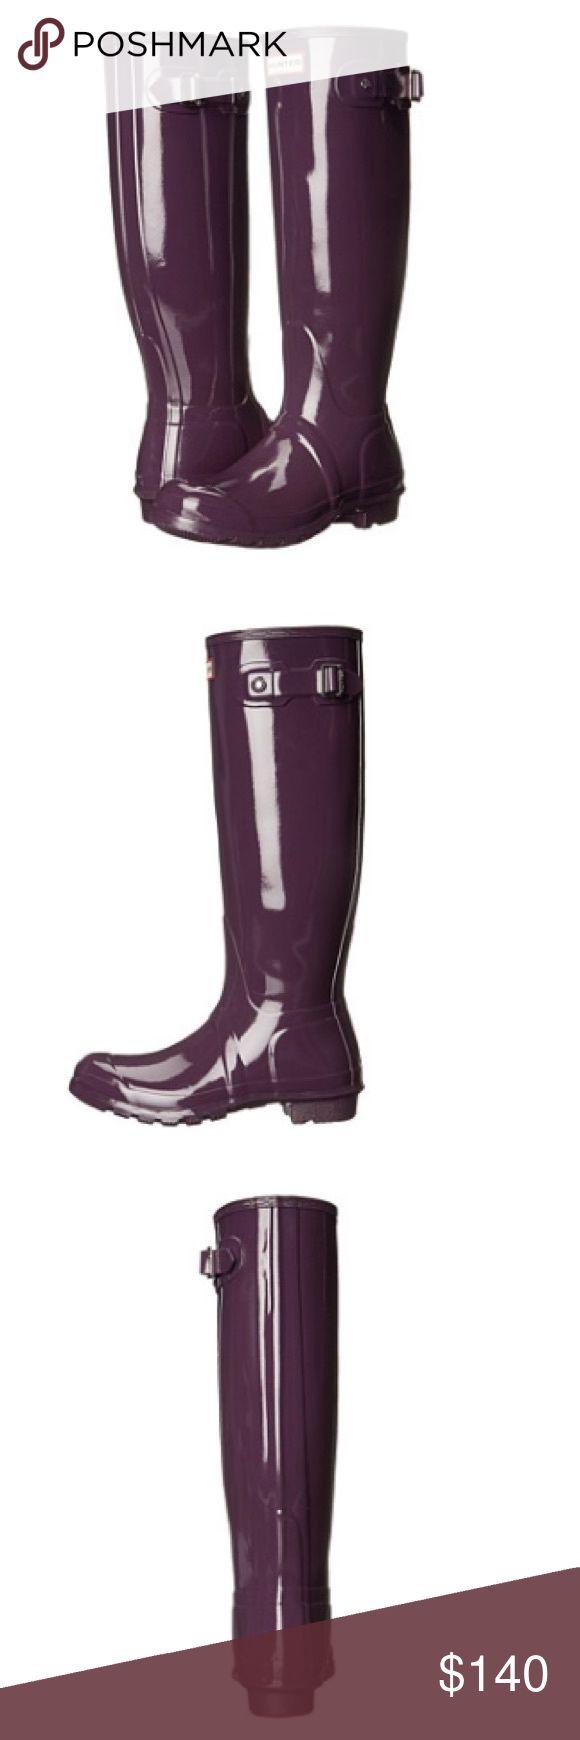 Brand new Hunter original gloss rain boots New in box Hunter Boots Shoes Winter & Rain Boots